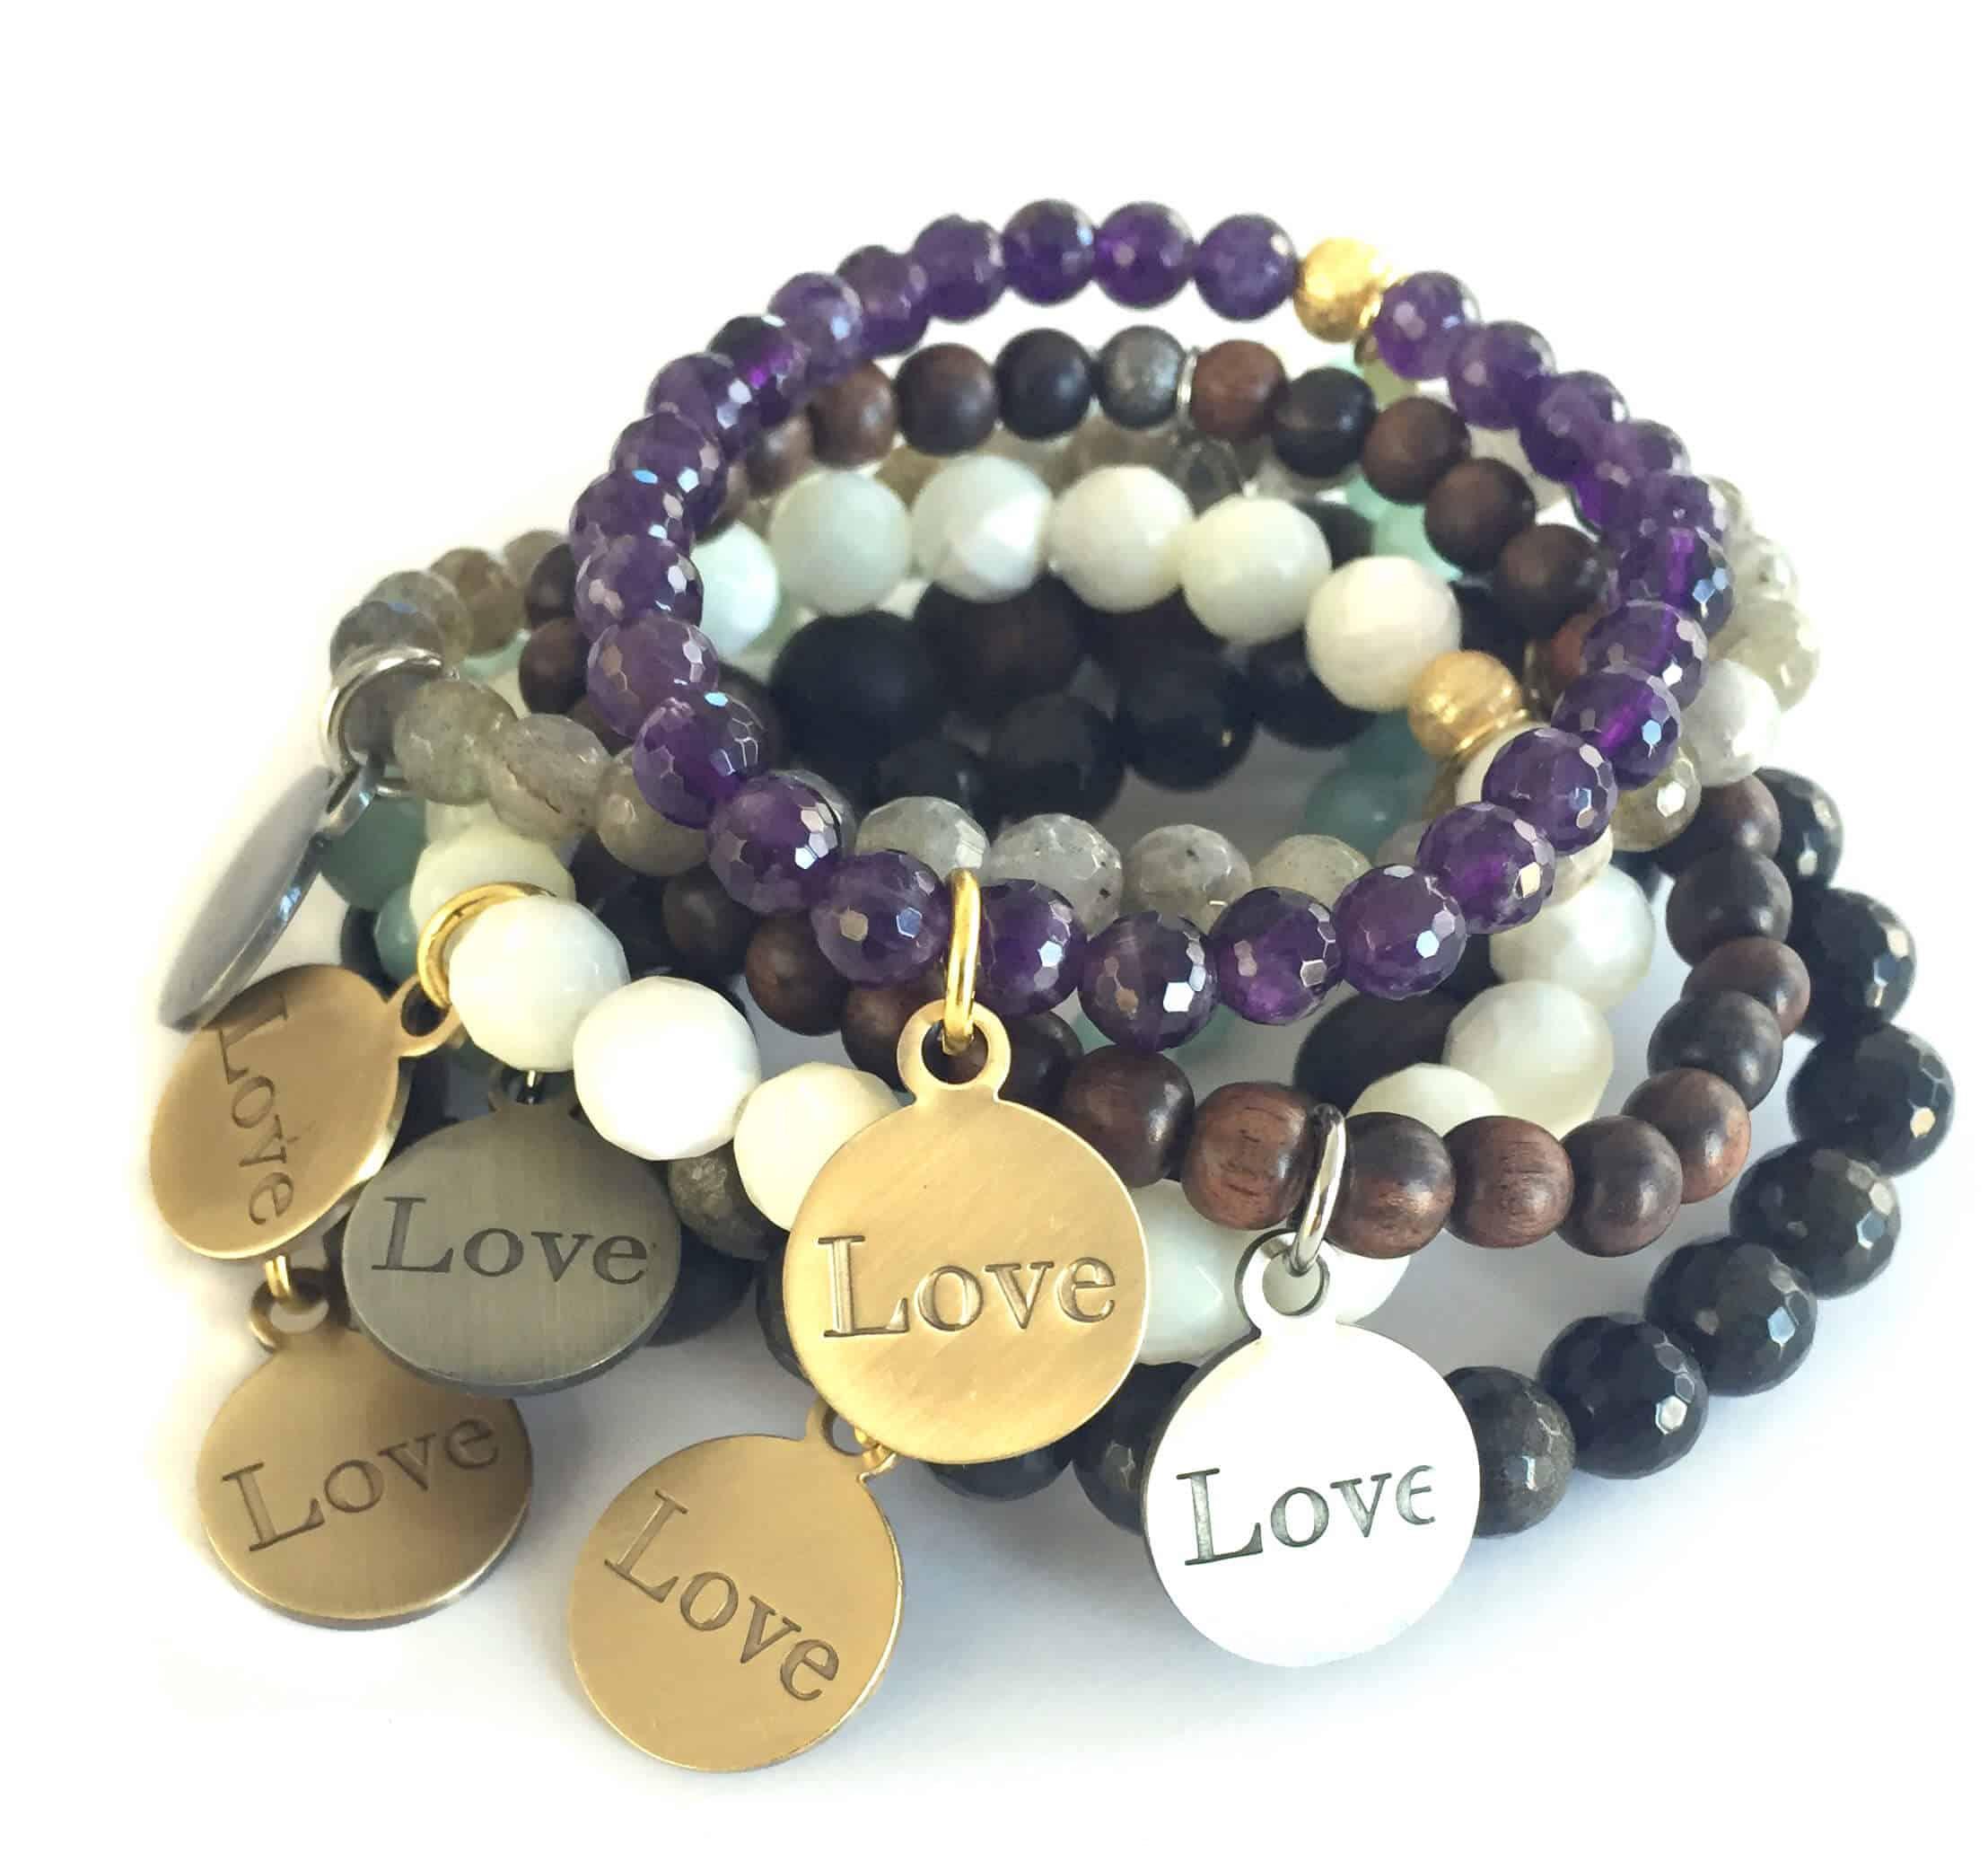 We All Need Love Simply Eartha Love Charm Bracelet